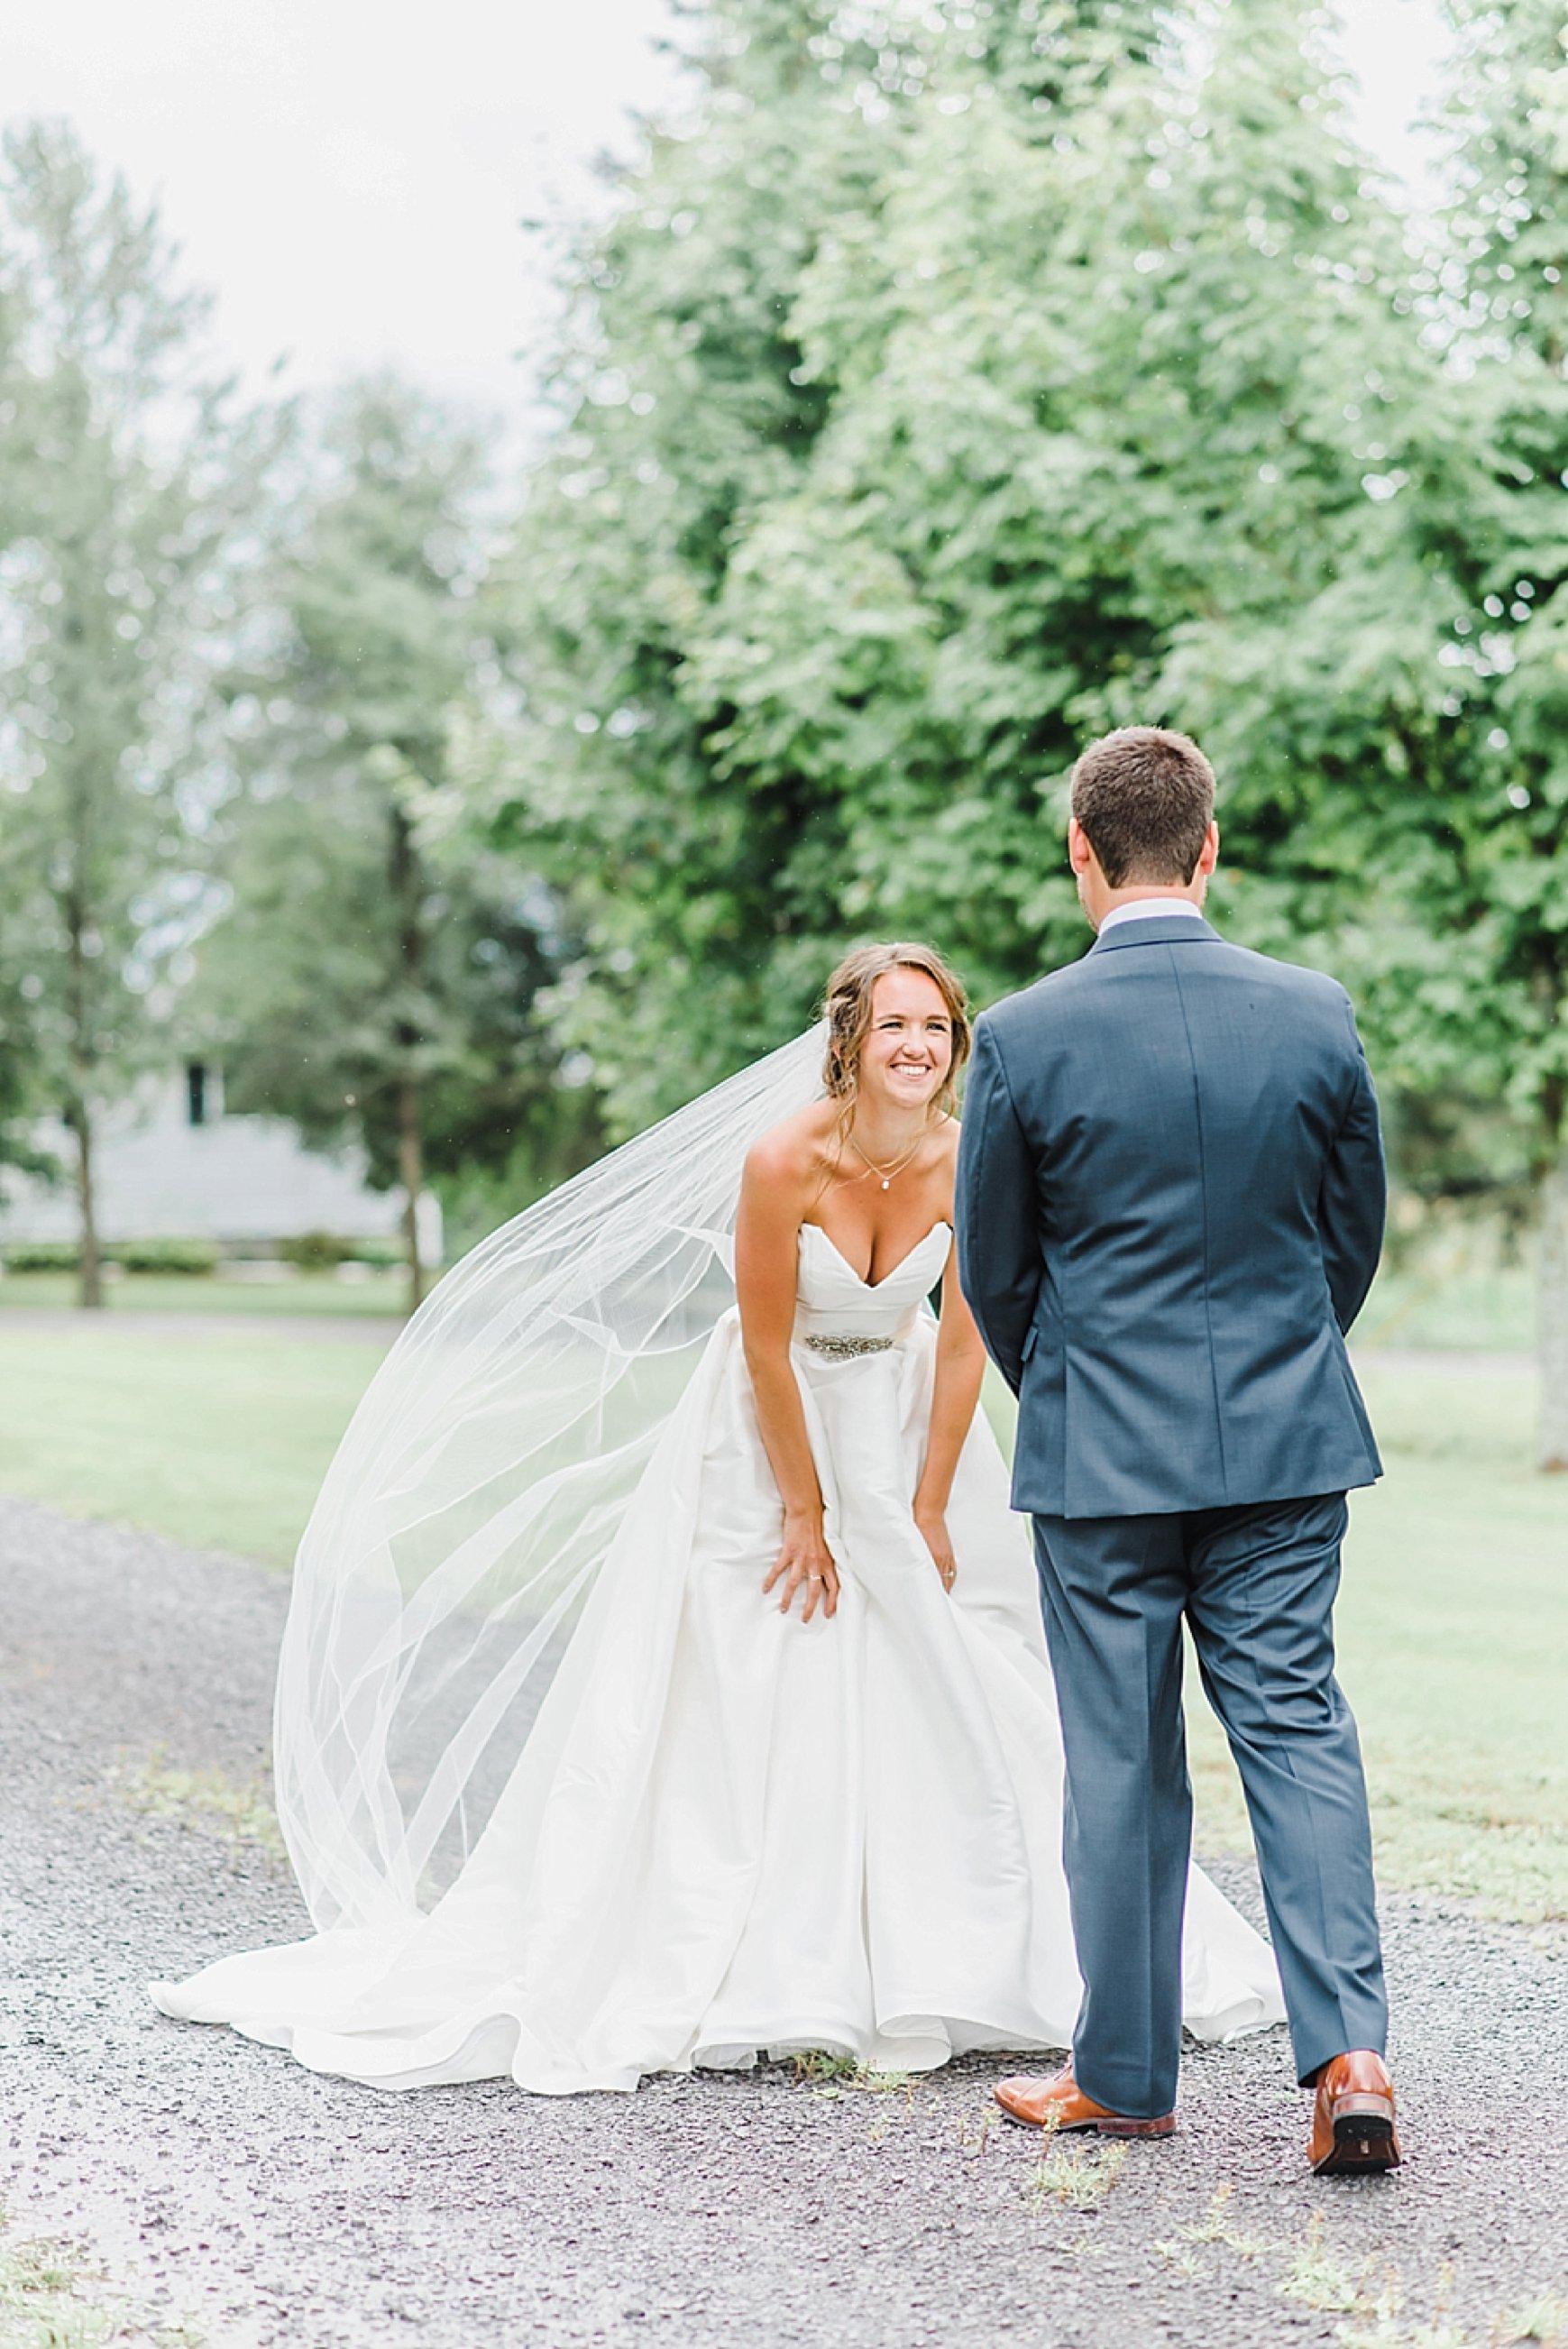 light airy indie fine art ottawa wedding photographer | Ali and Batoul Photography_0488.jpg